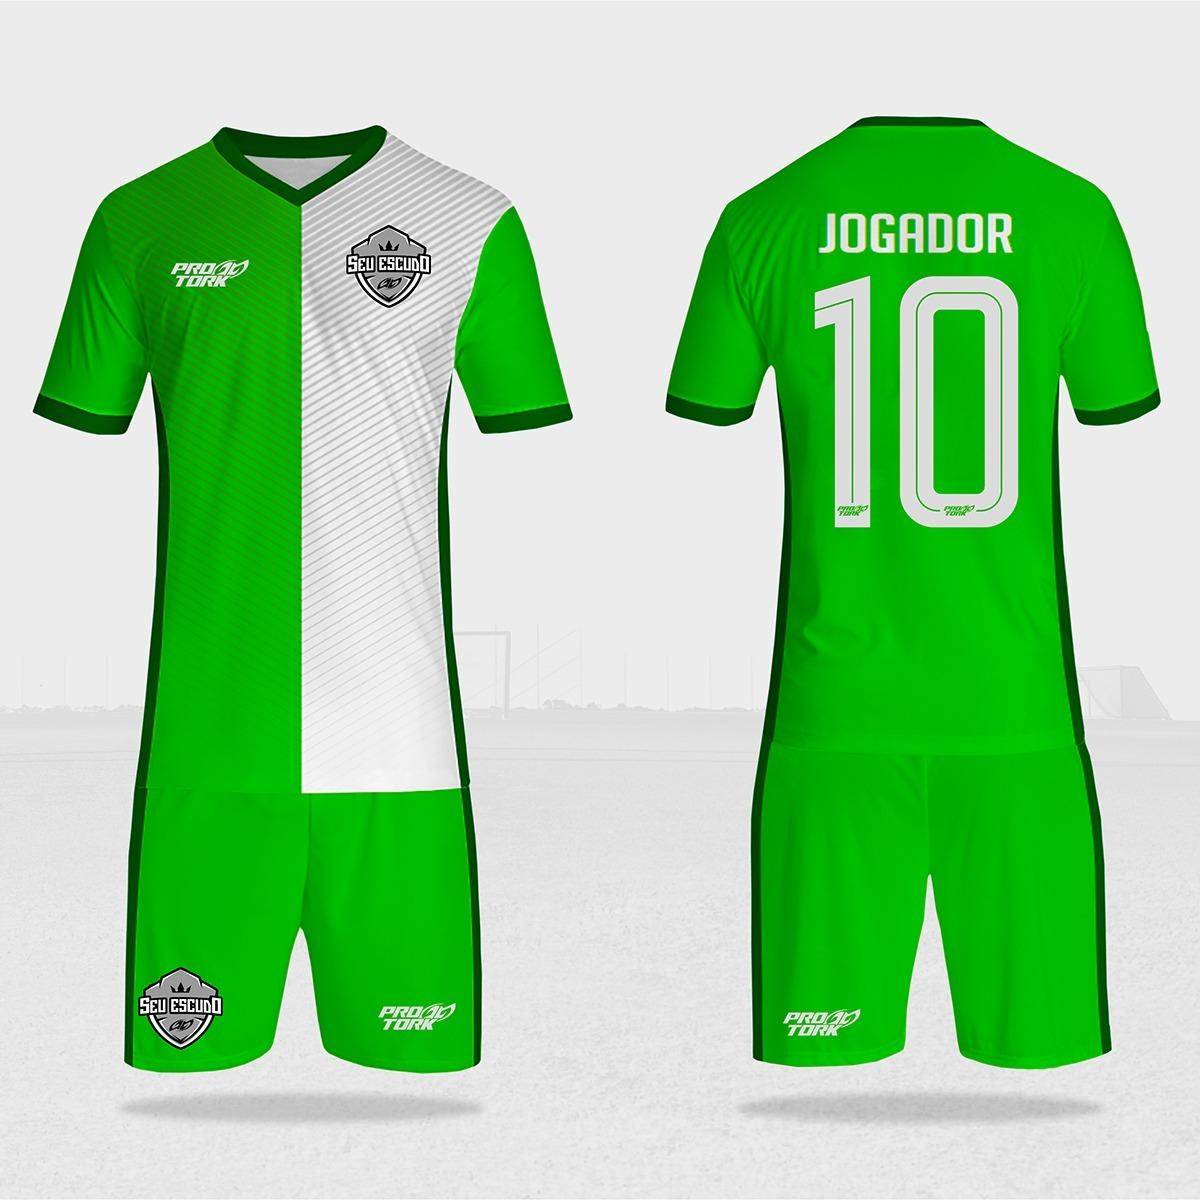 2b5dc1260 Carregando zoom... camisa de time personalizada futebol ou futsal